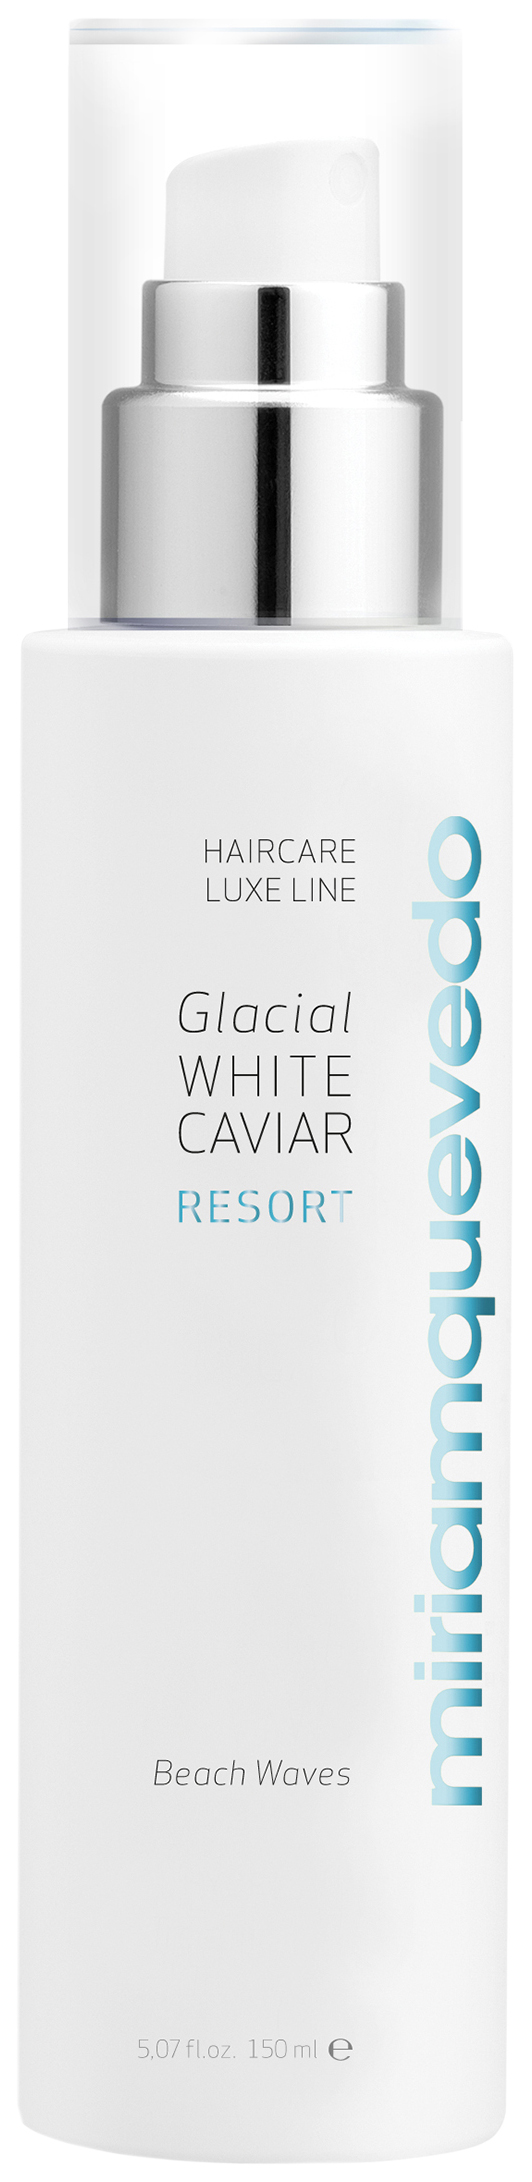 Текстурирующий спрей Miriamquevedo Glacial White Caviar для создания